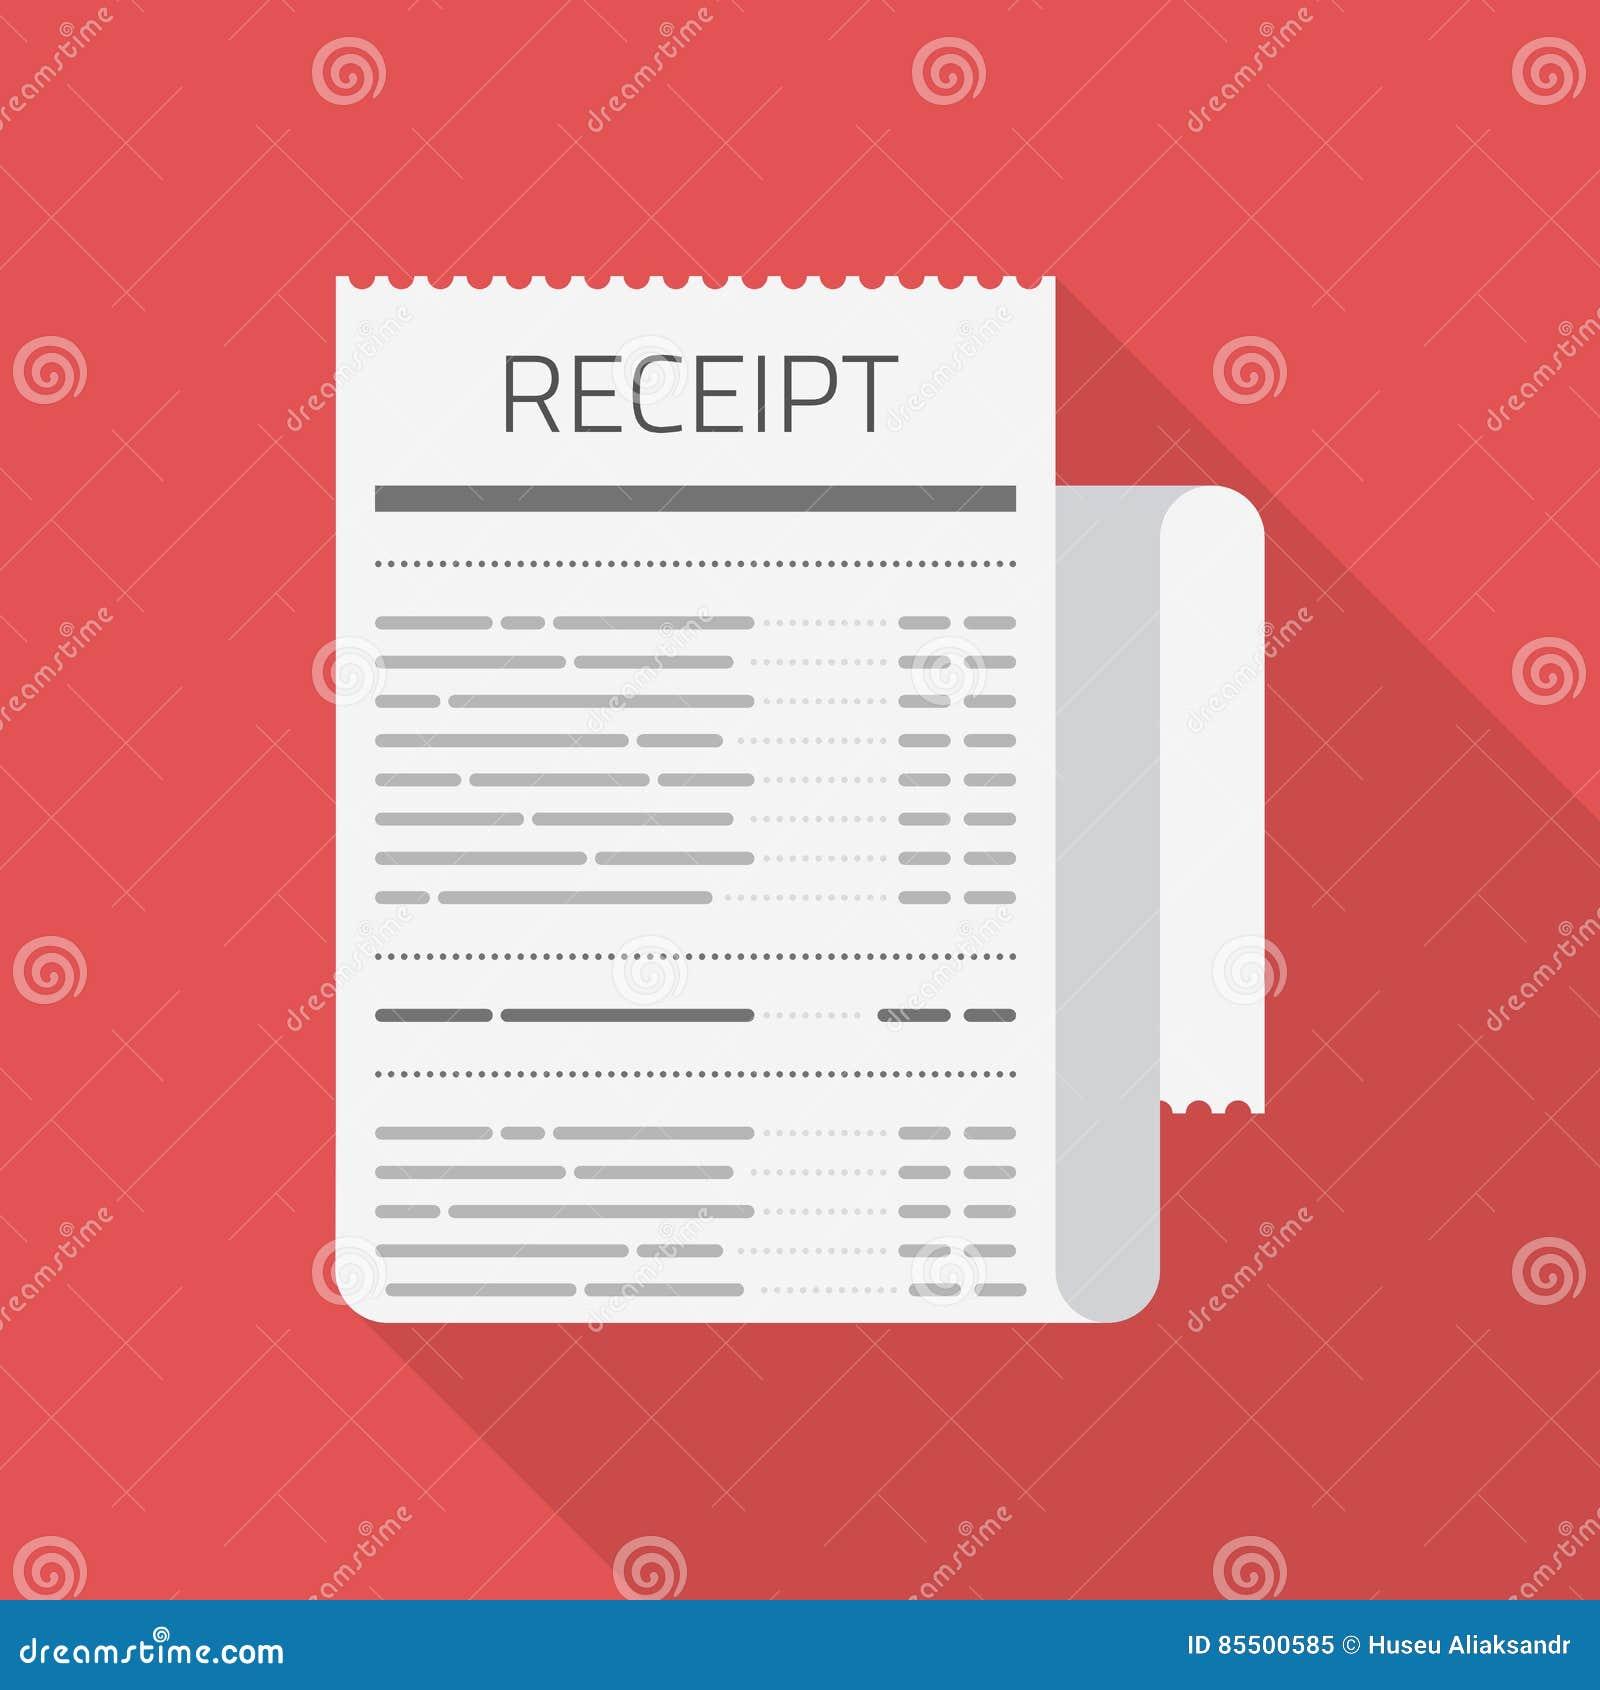 bank receipt generator dogecoin game